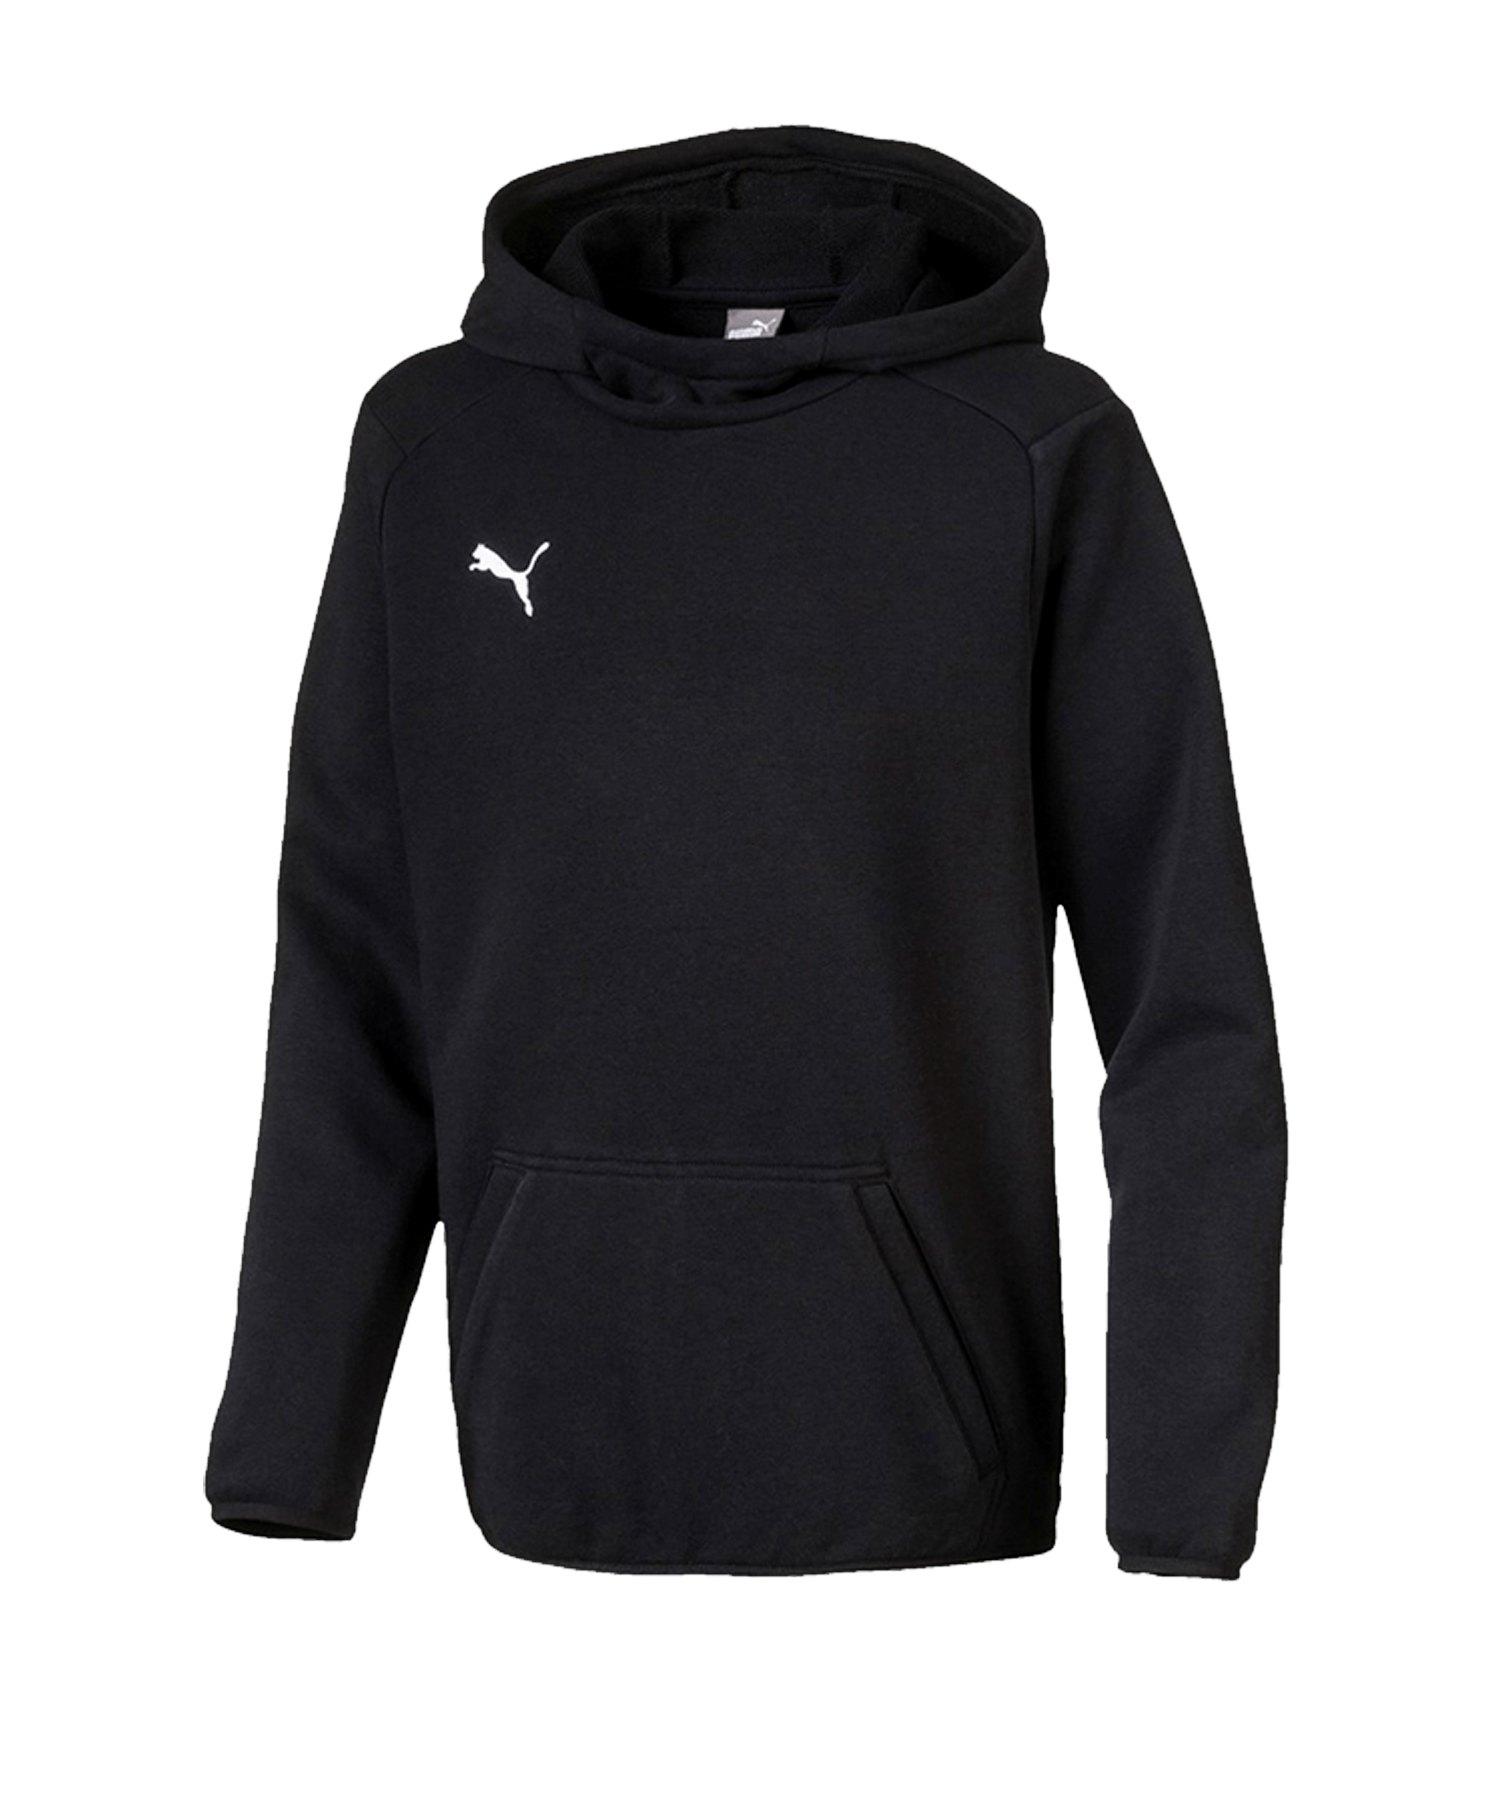 PUMA LIGA Casuals Kapuzensweatshirt Kids F03 - schwarz